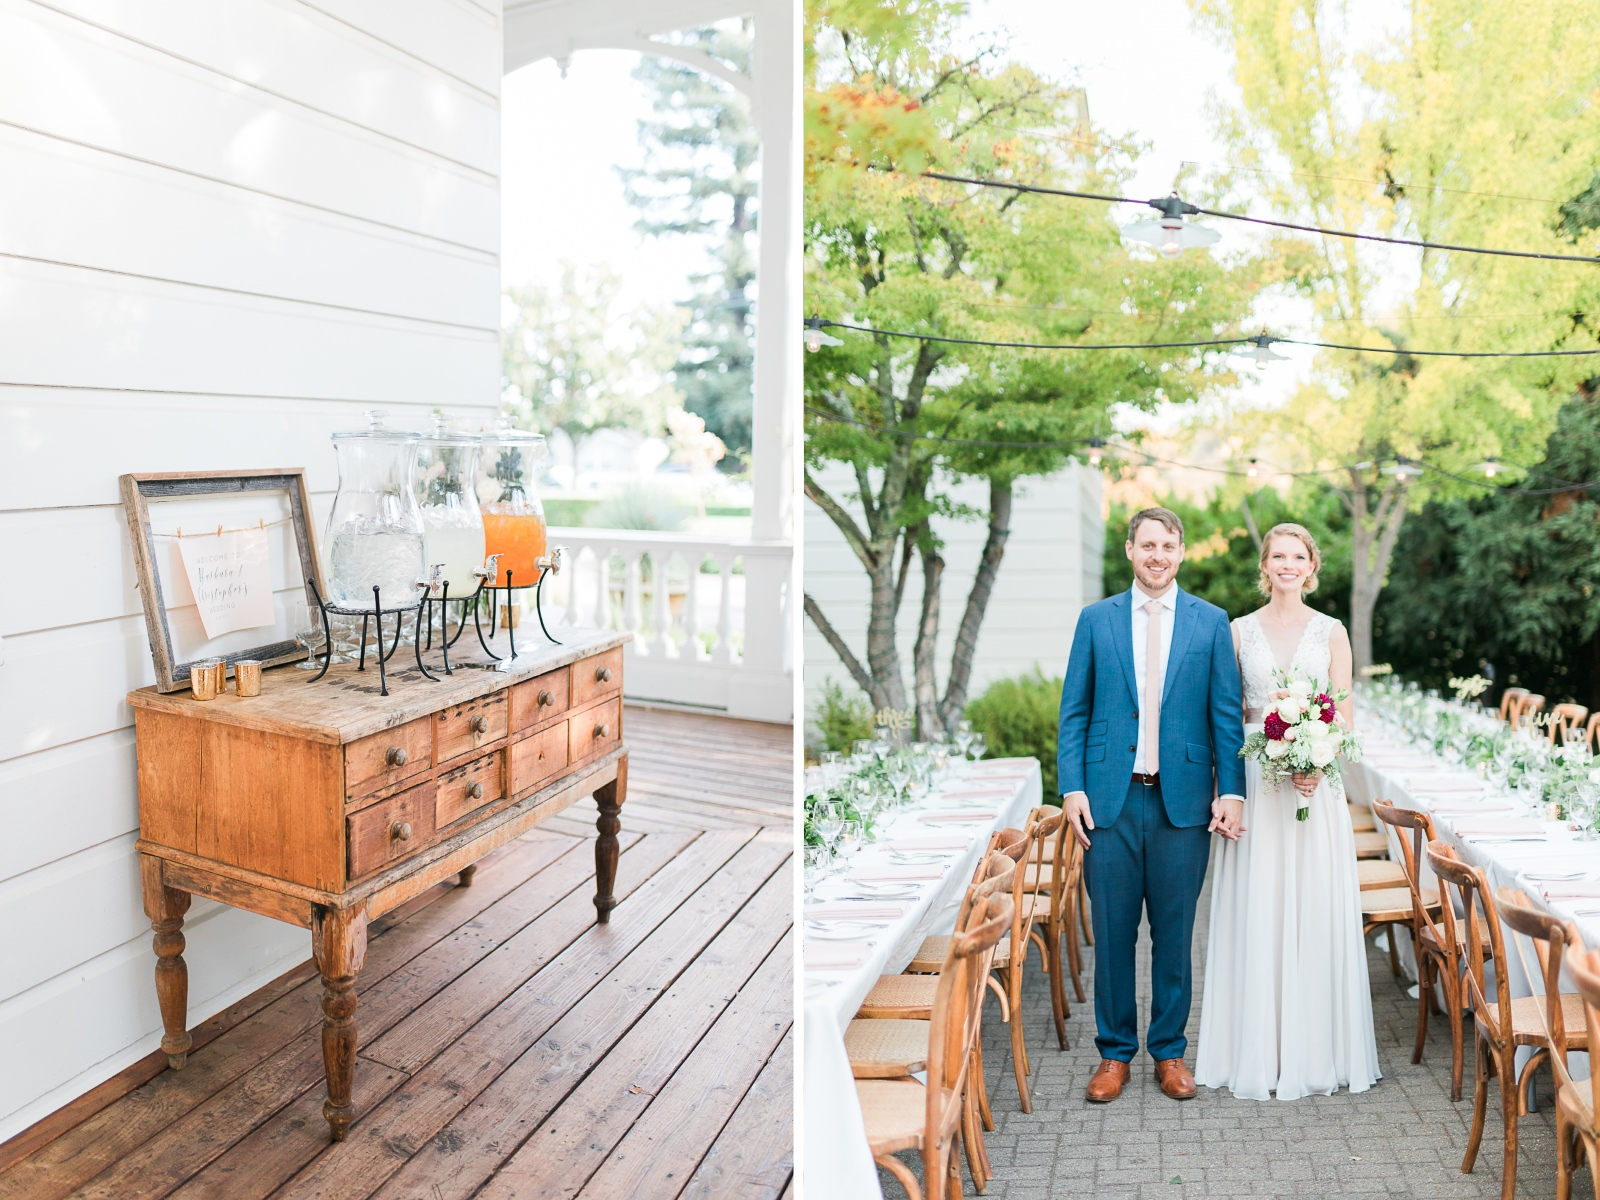 Generals+Daughter+Wedding+Photos+by+JBJ+Pictures+-+Ramekins+Wedding+Venue+Photographer+in+Sonoma+Napa+(32).jpg